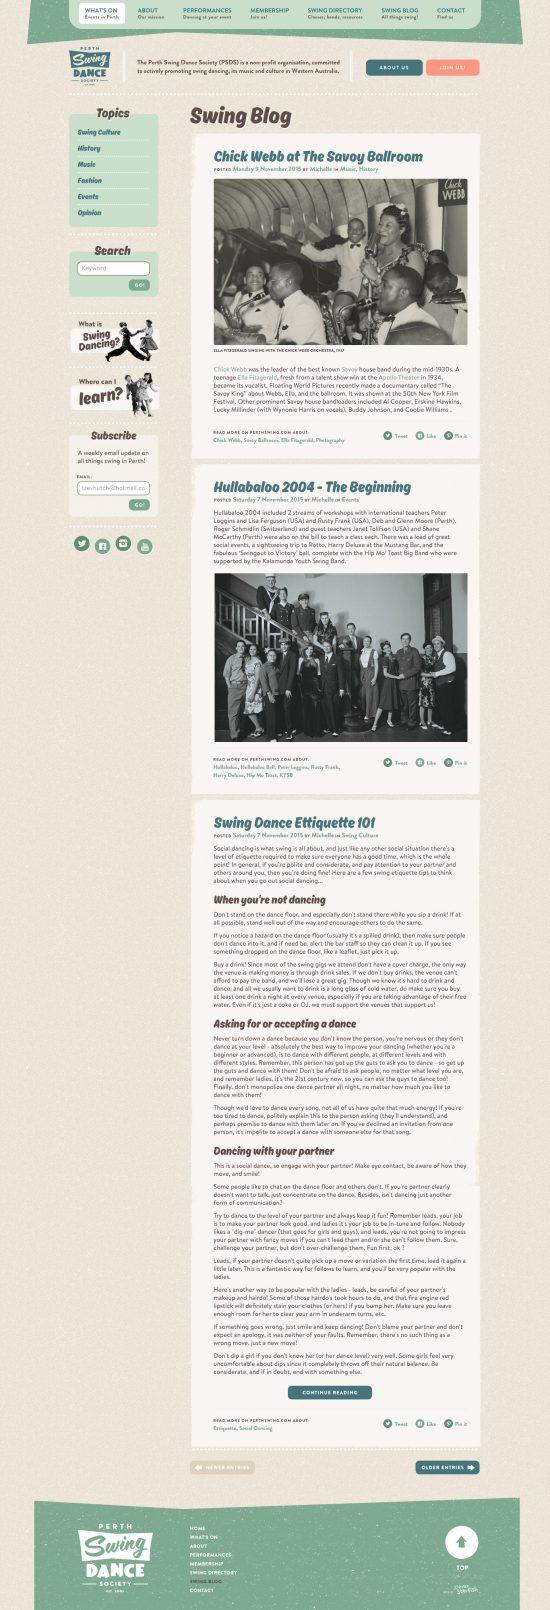 Perth Swing Blog